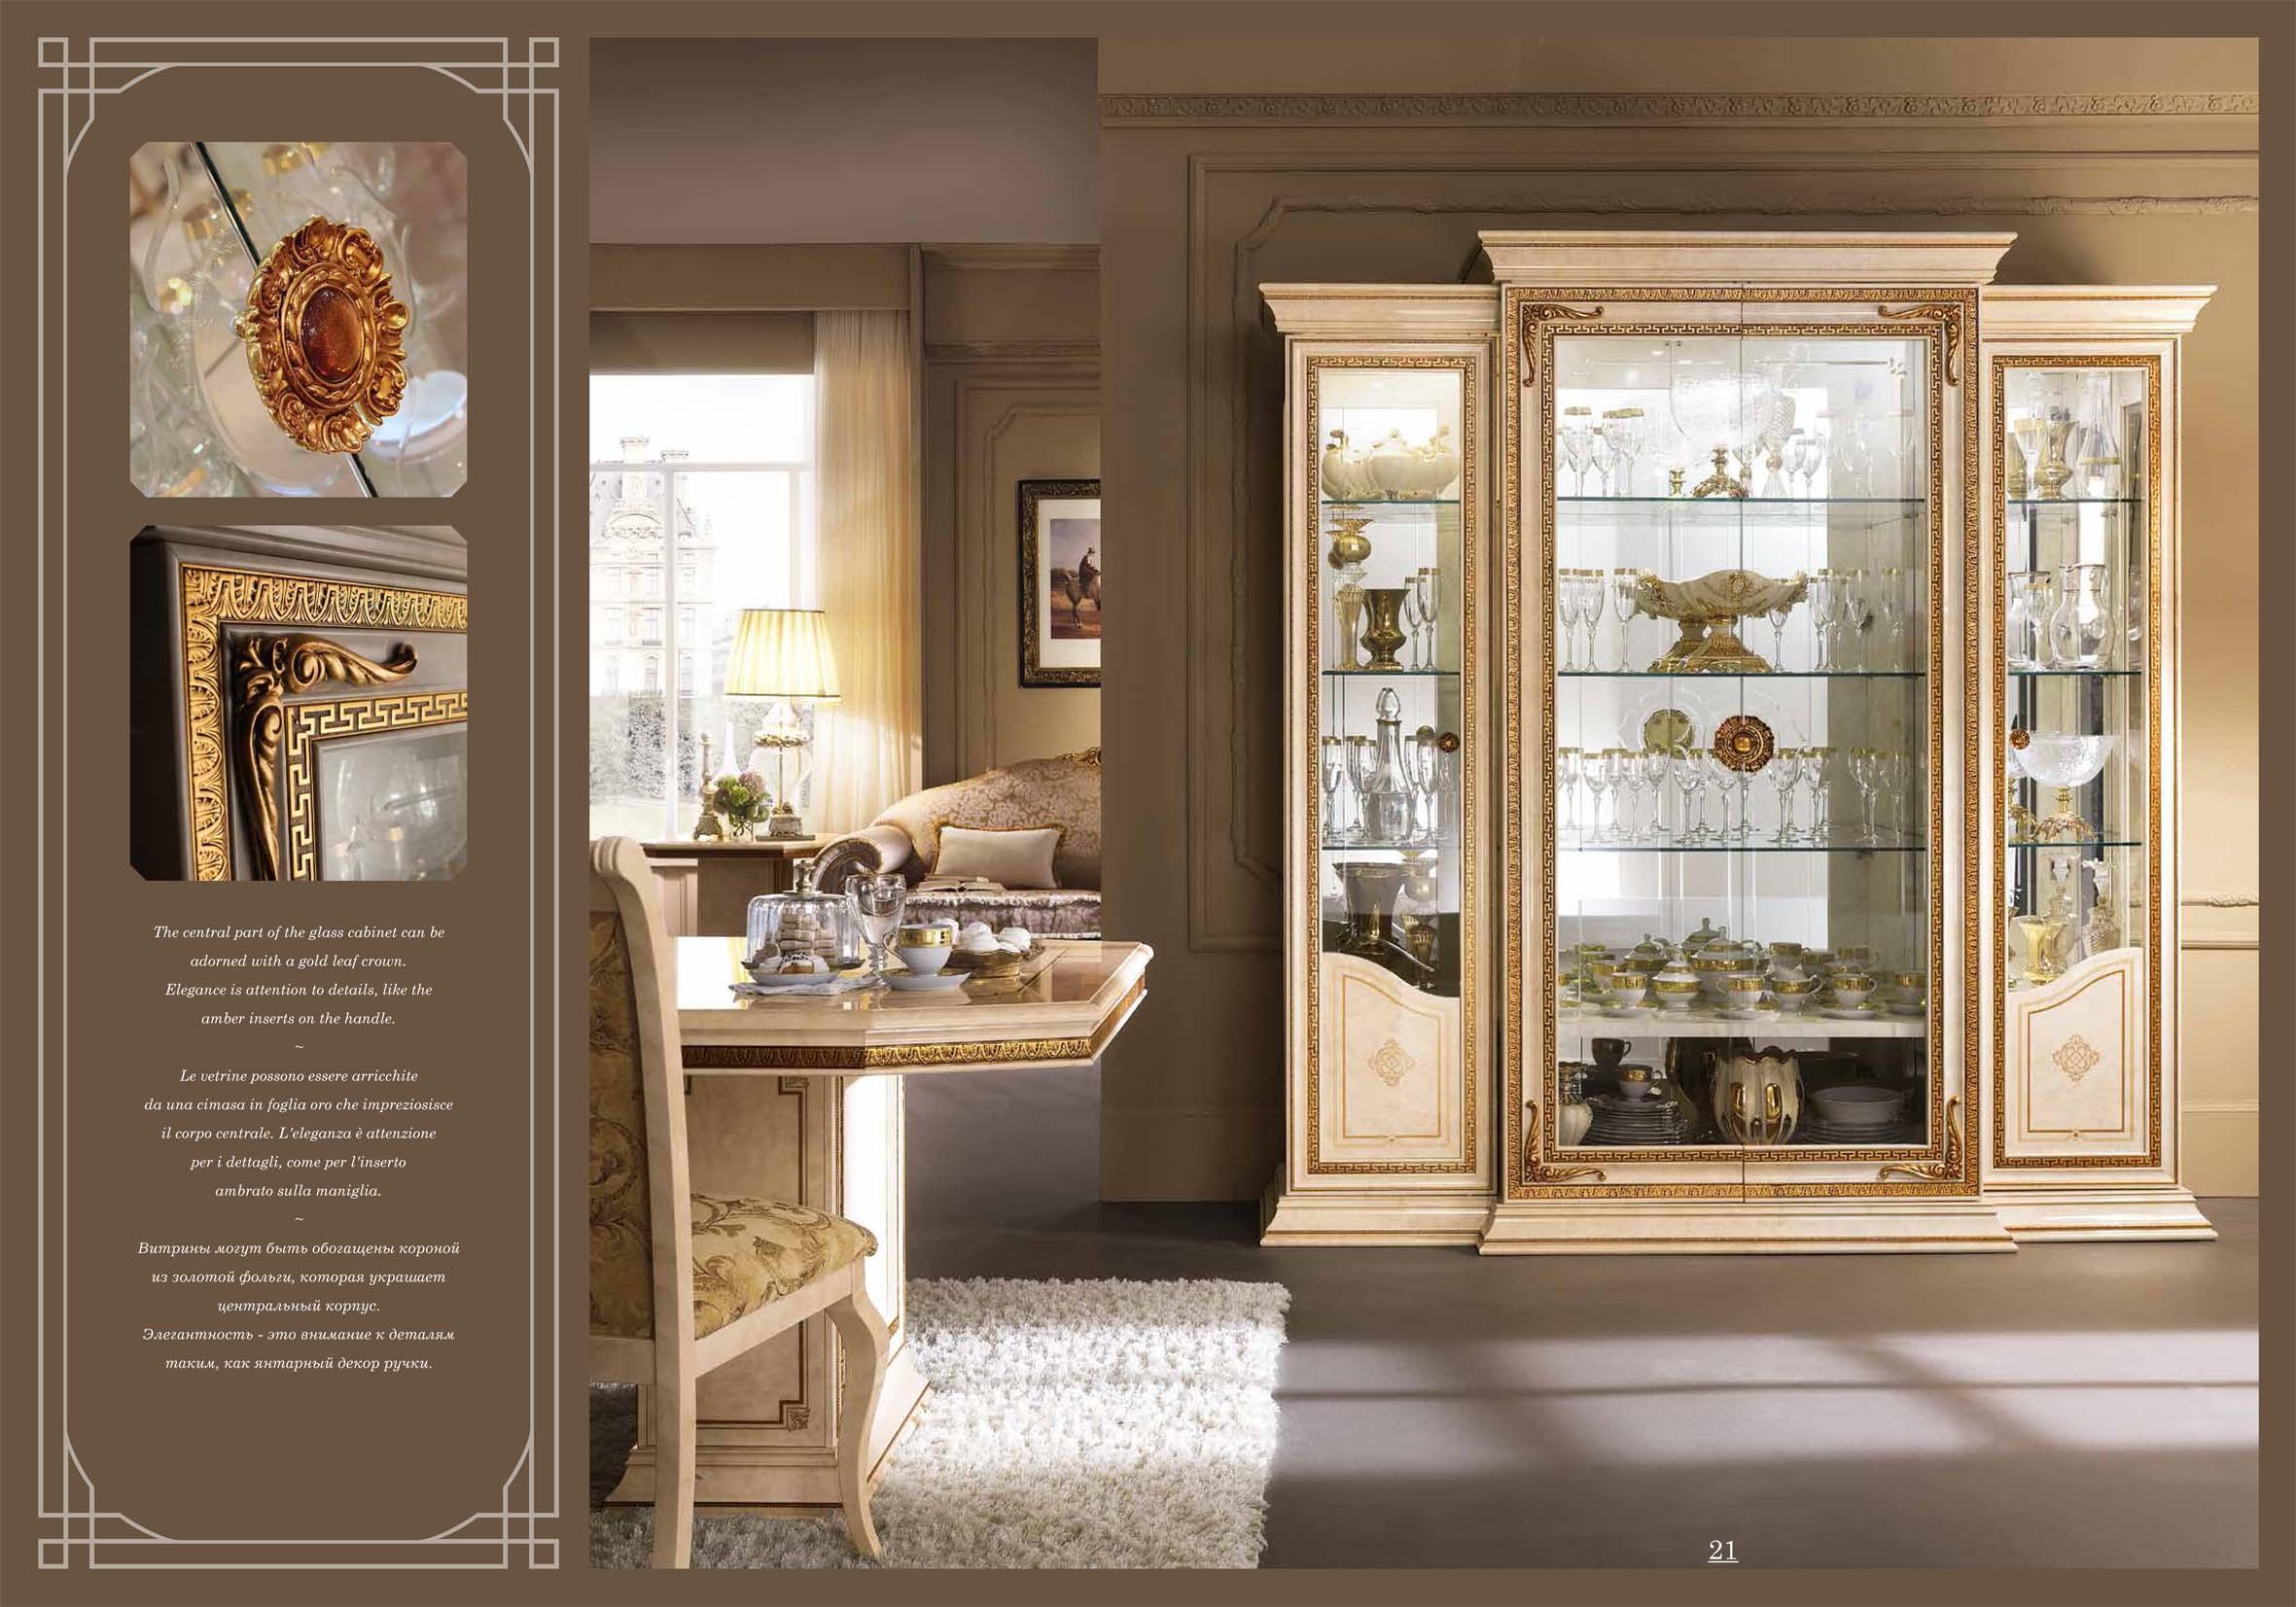 Leonardo day arredoclassic dining room italy collections for Leonardo s dining room